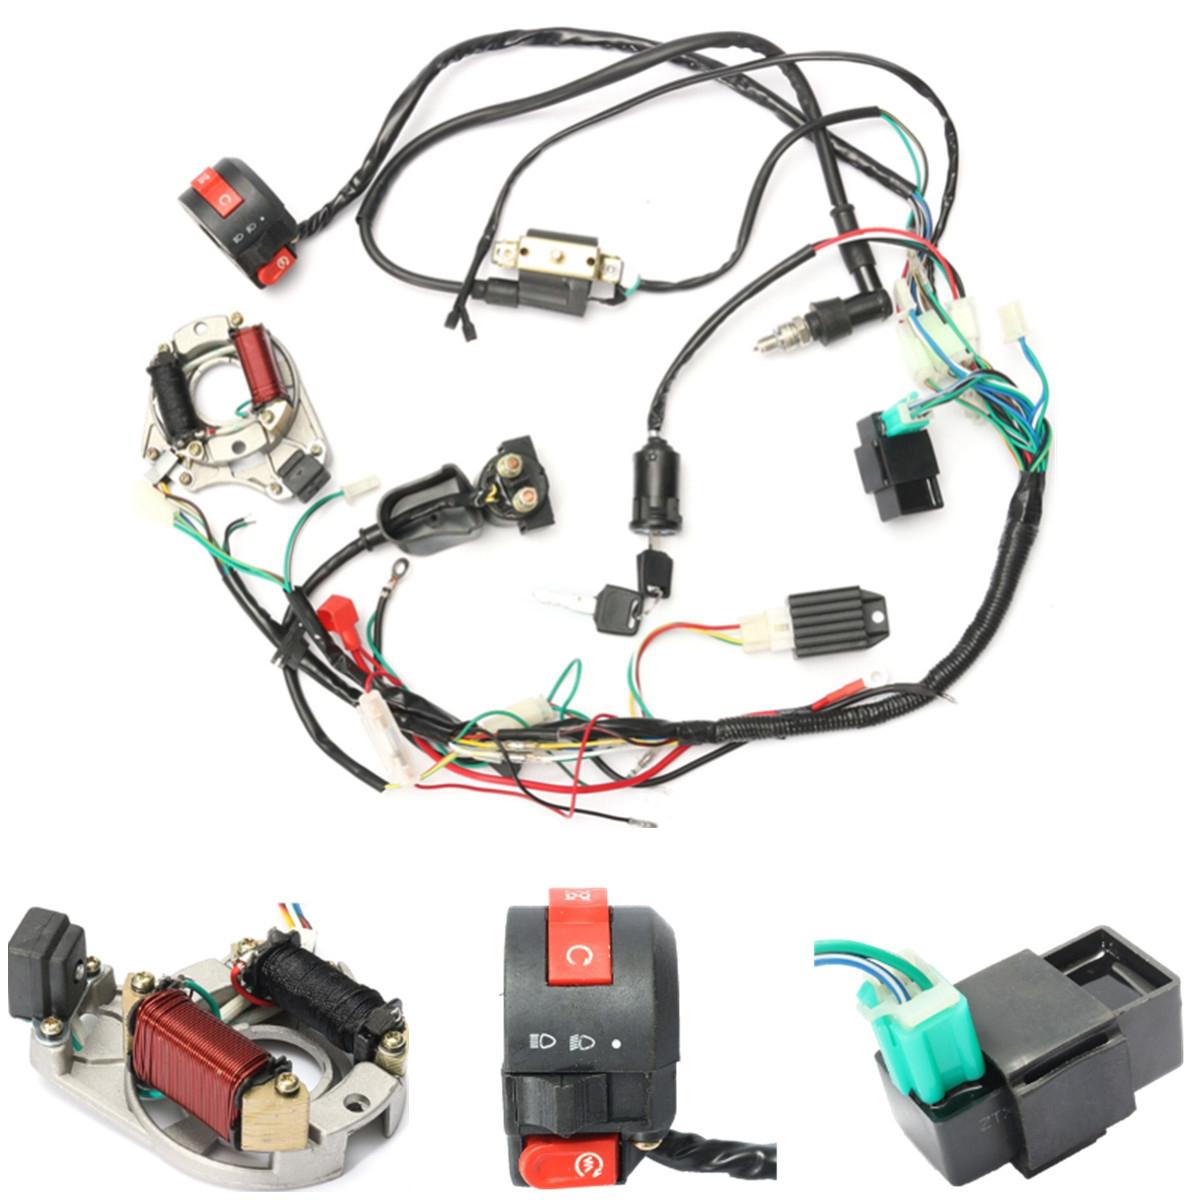 hight resolution of 50cc 70cc 90cc 110cc cdi wire harness assembly wiring kit atv electric start quad